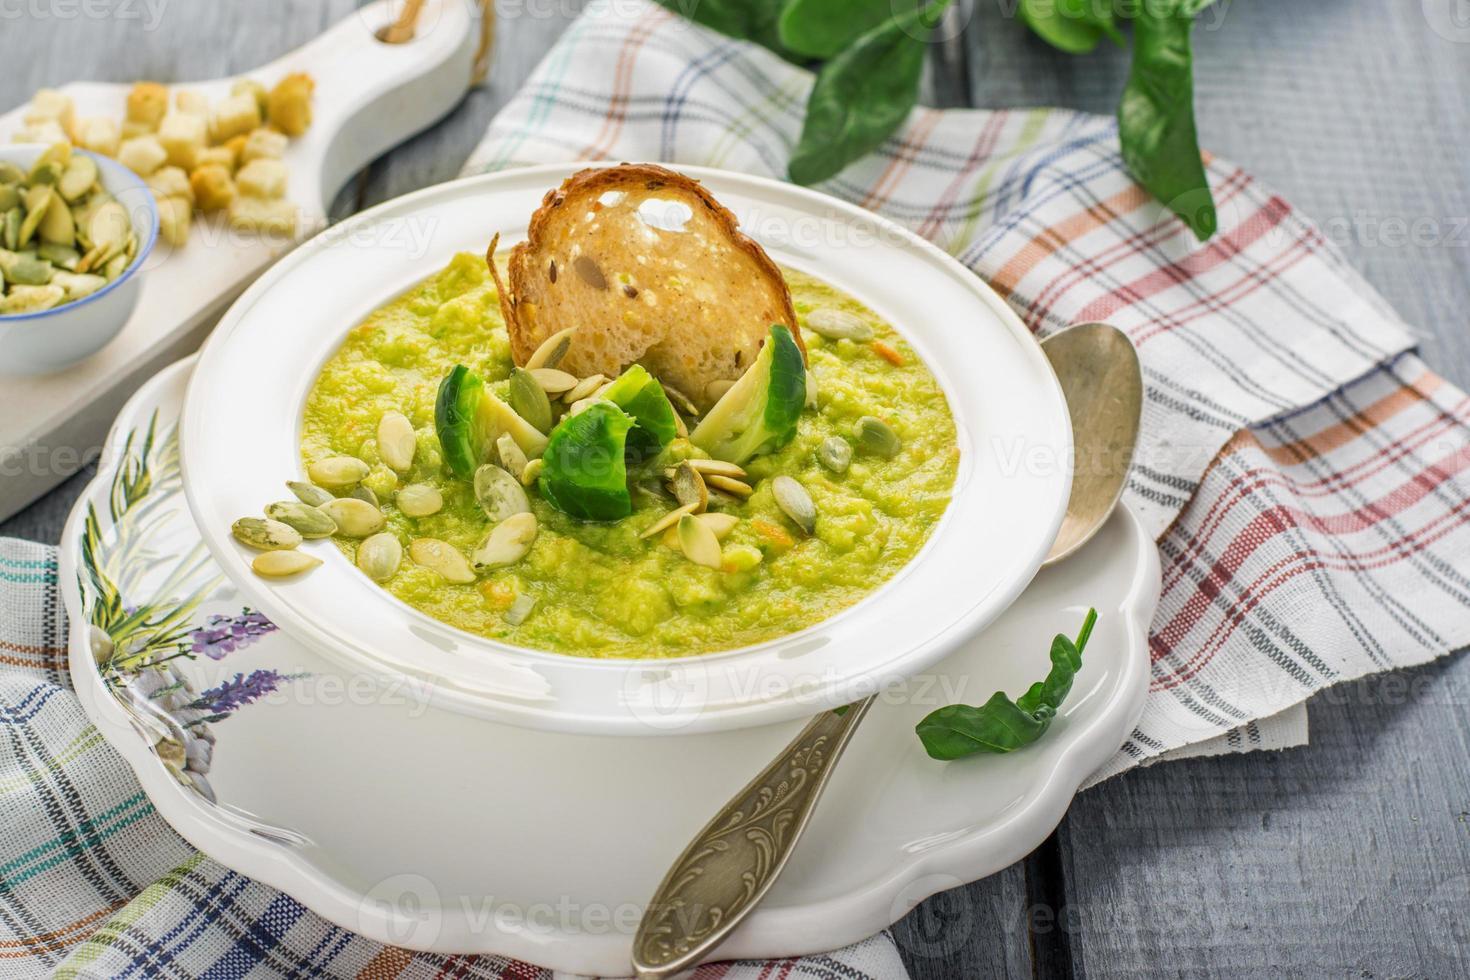 purê de sopa grossa de legumes com couve de bruxelas, croutons, sementes de abóbora foto